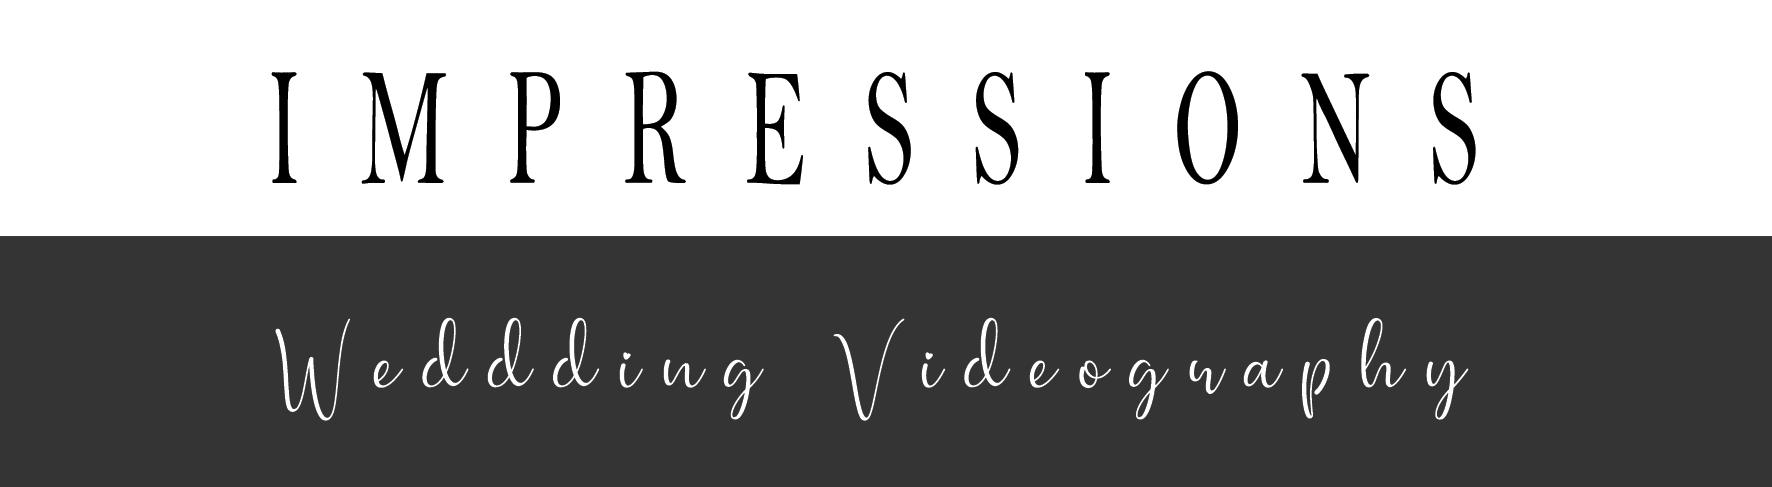 Impressions Wedding Video